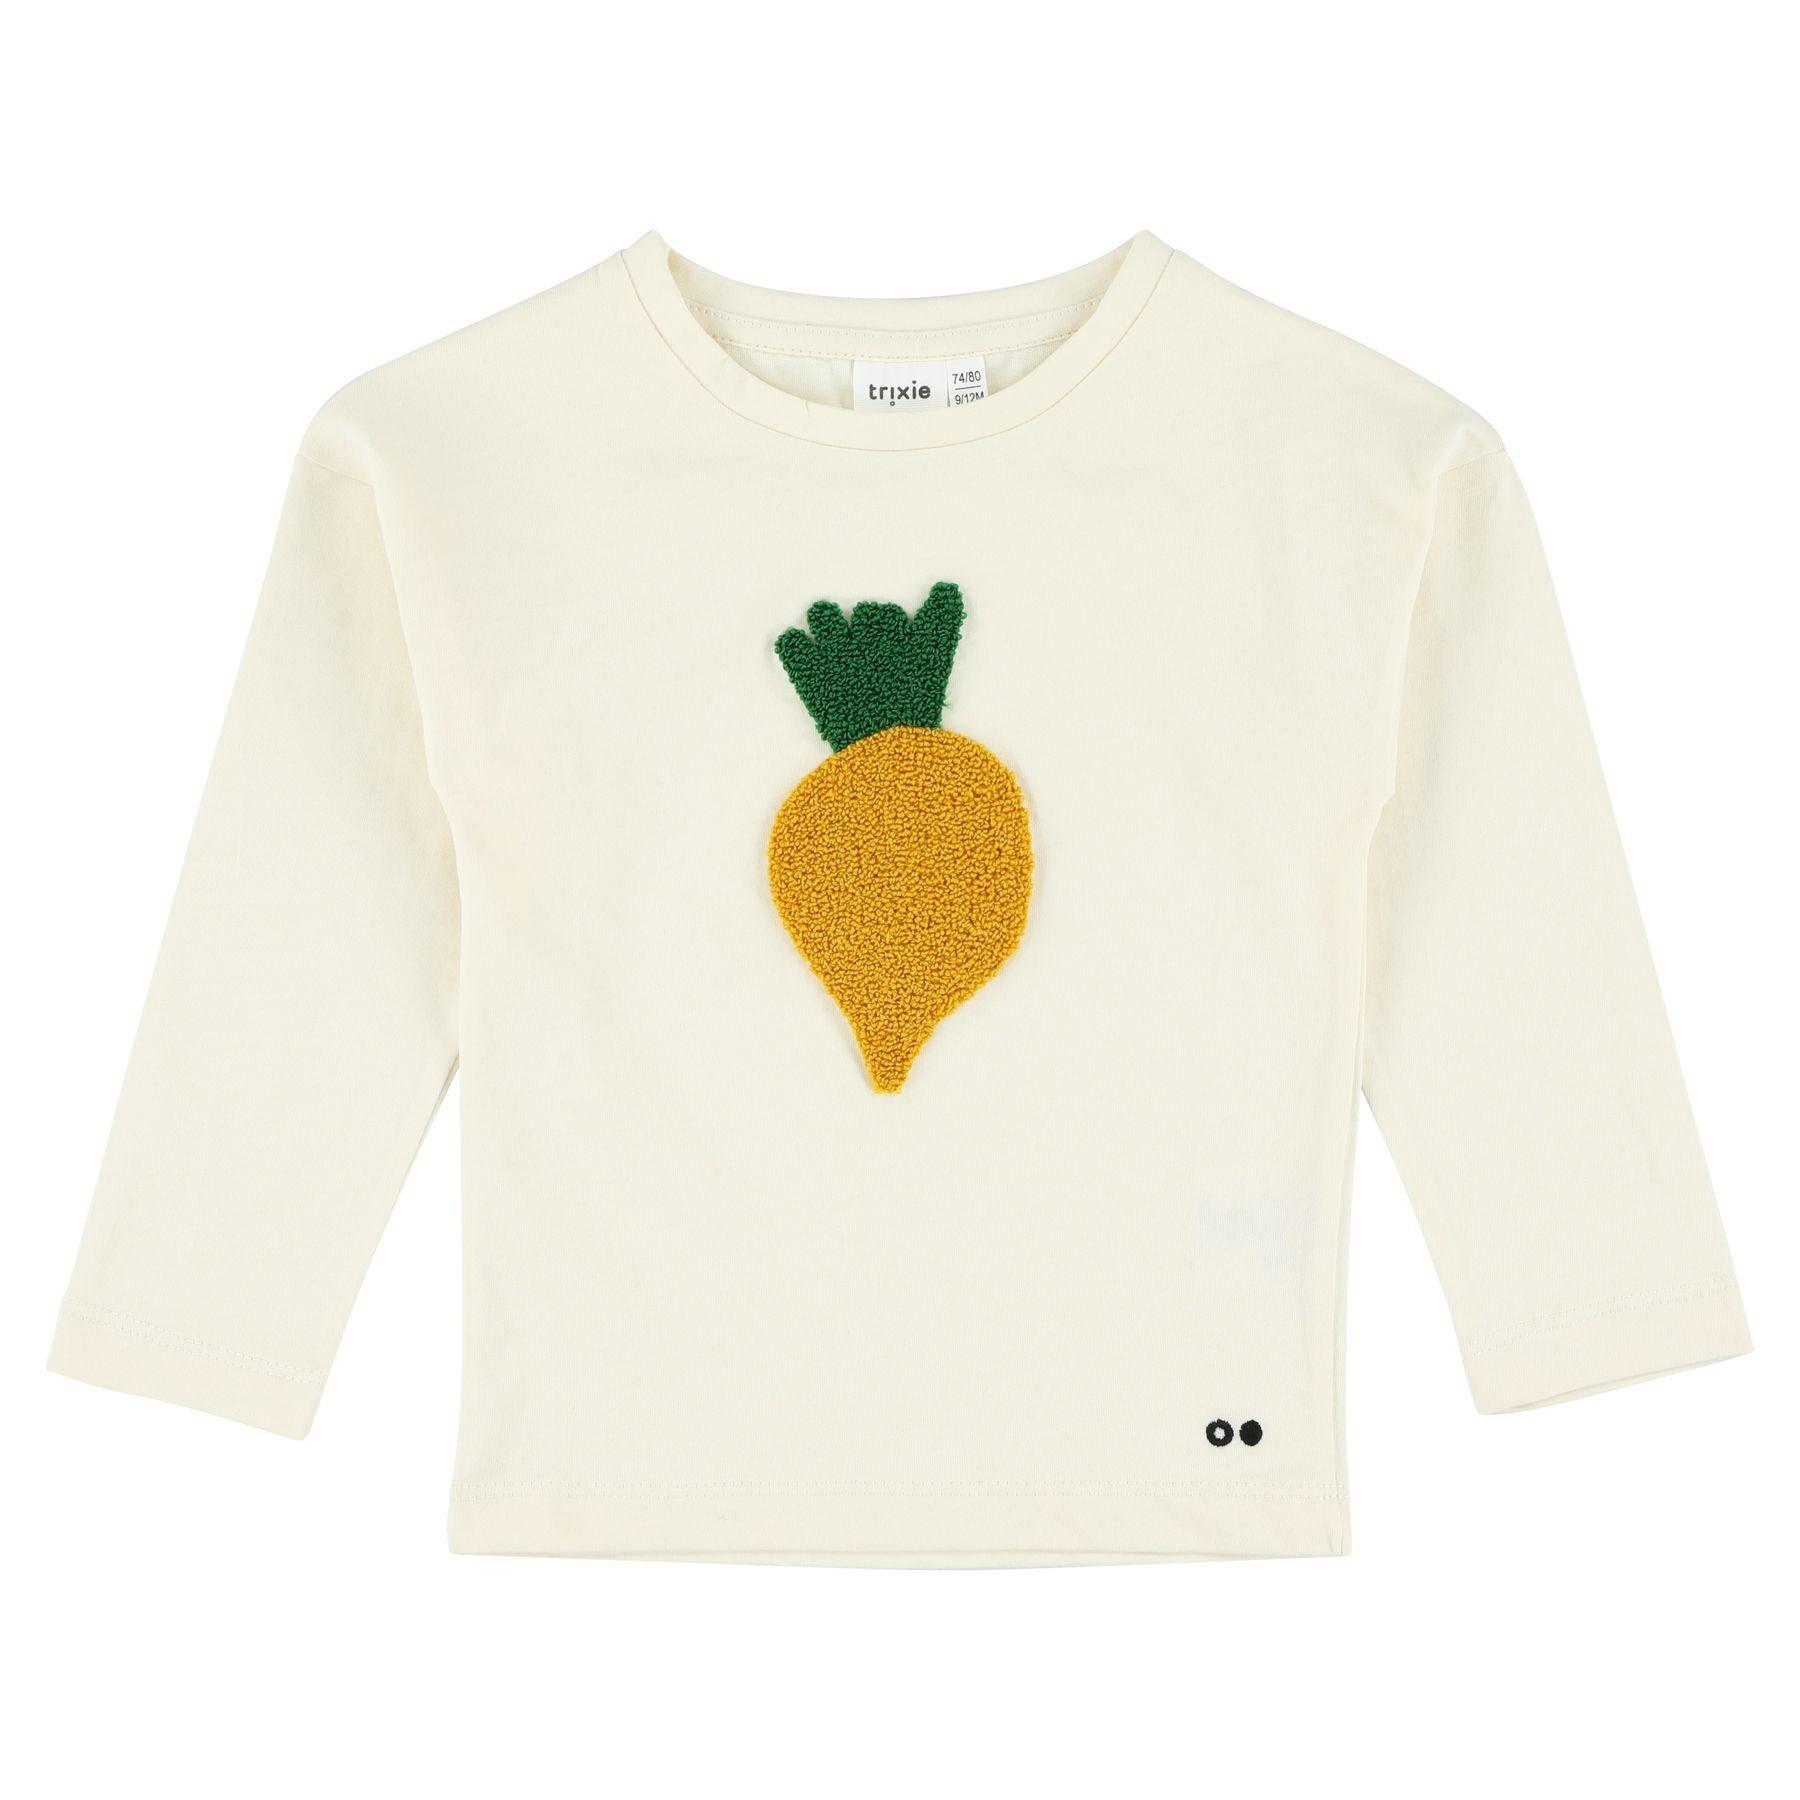 Trixie - T-shirt lange mouwen Tiny Turnip - 8Y